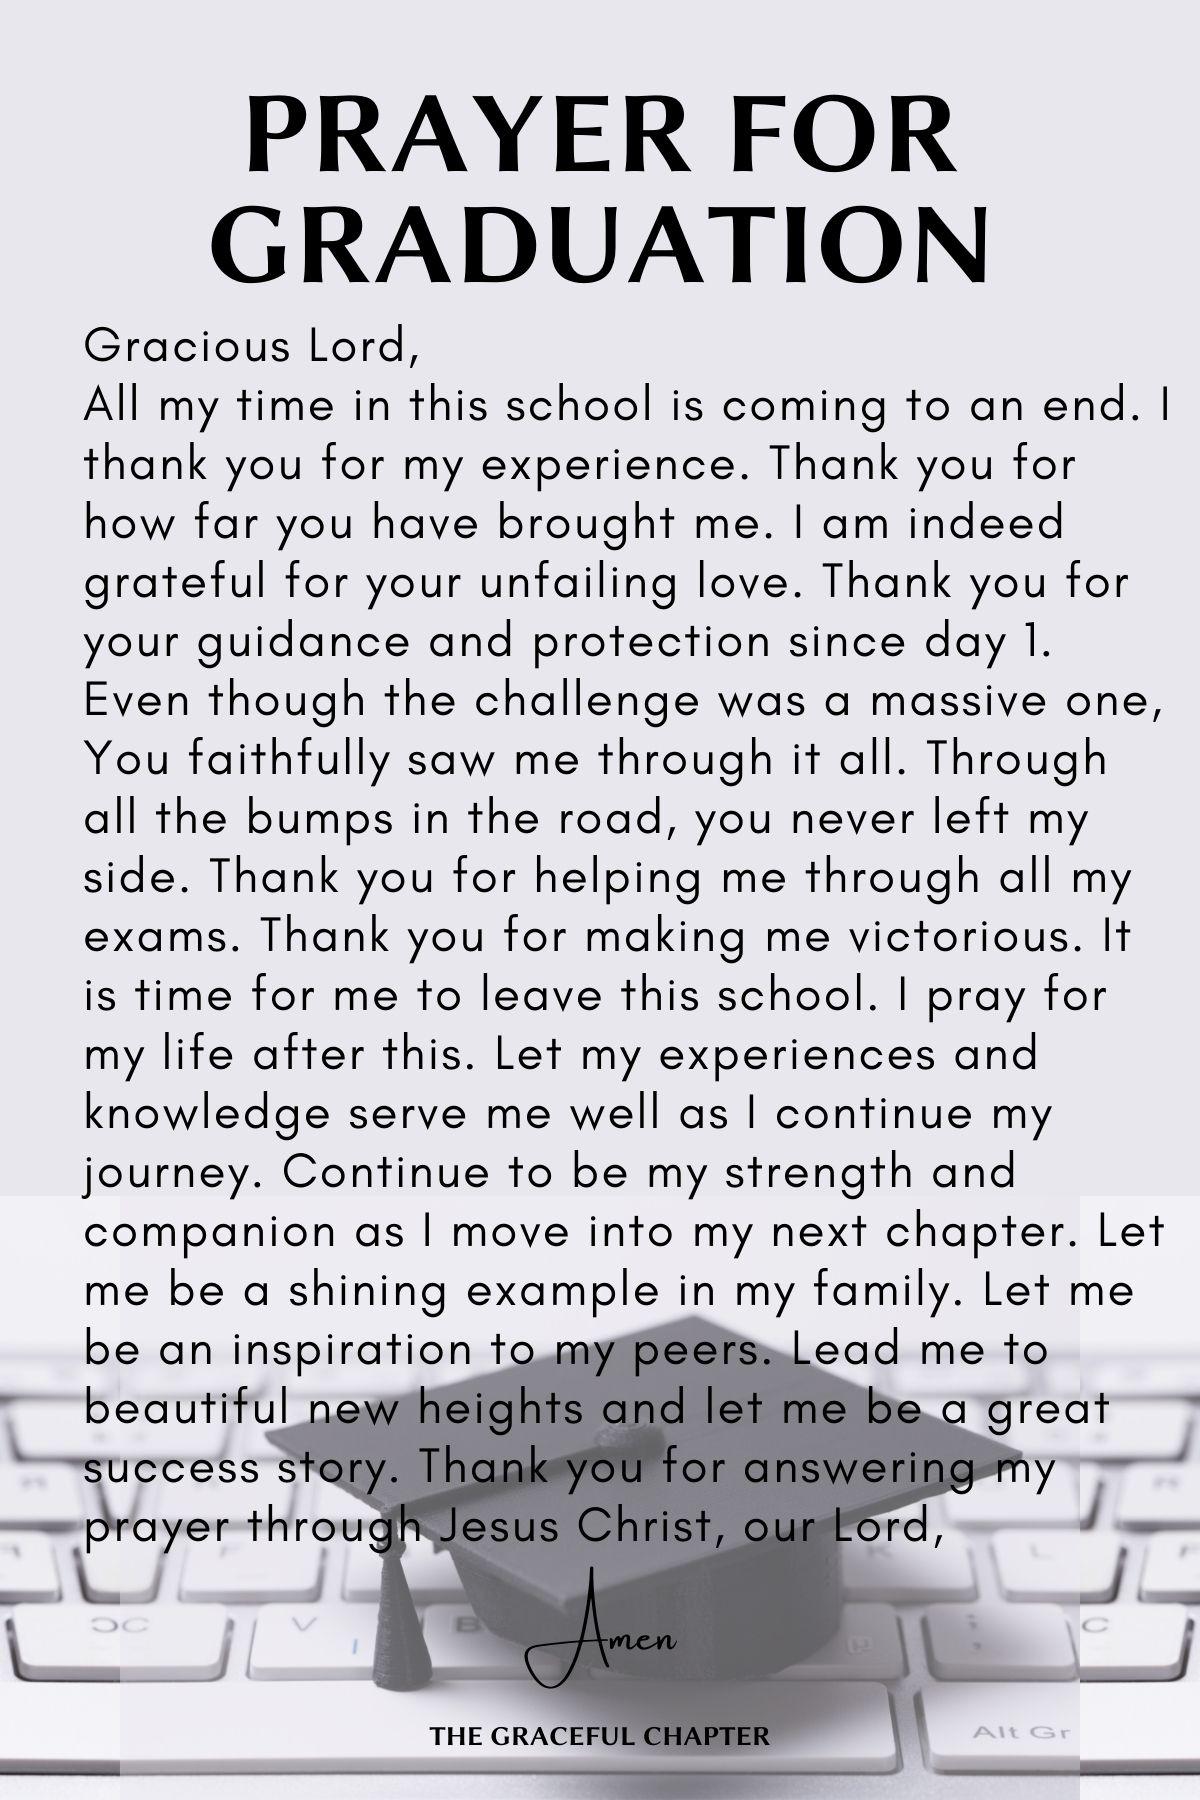 Prayer for graduation